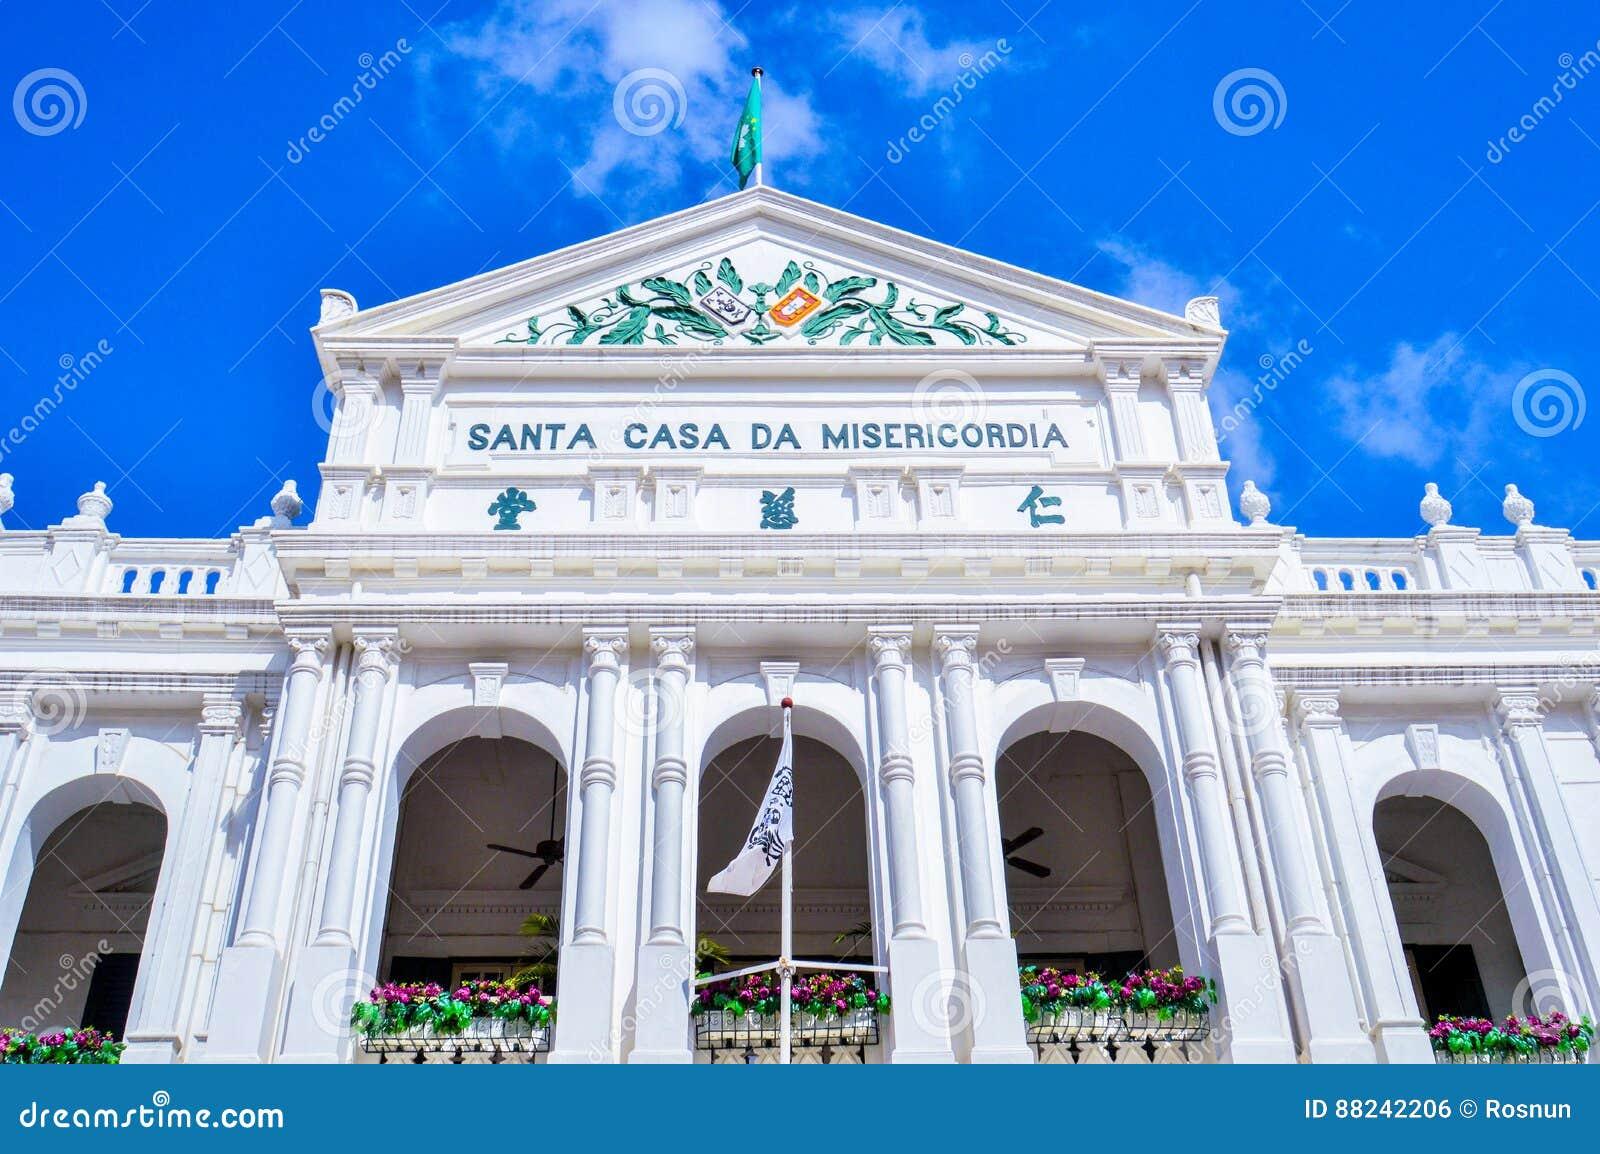 Das heilige Haus des Gnadengebäudes in Macao